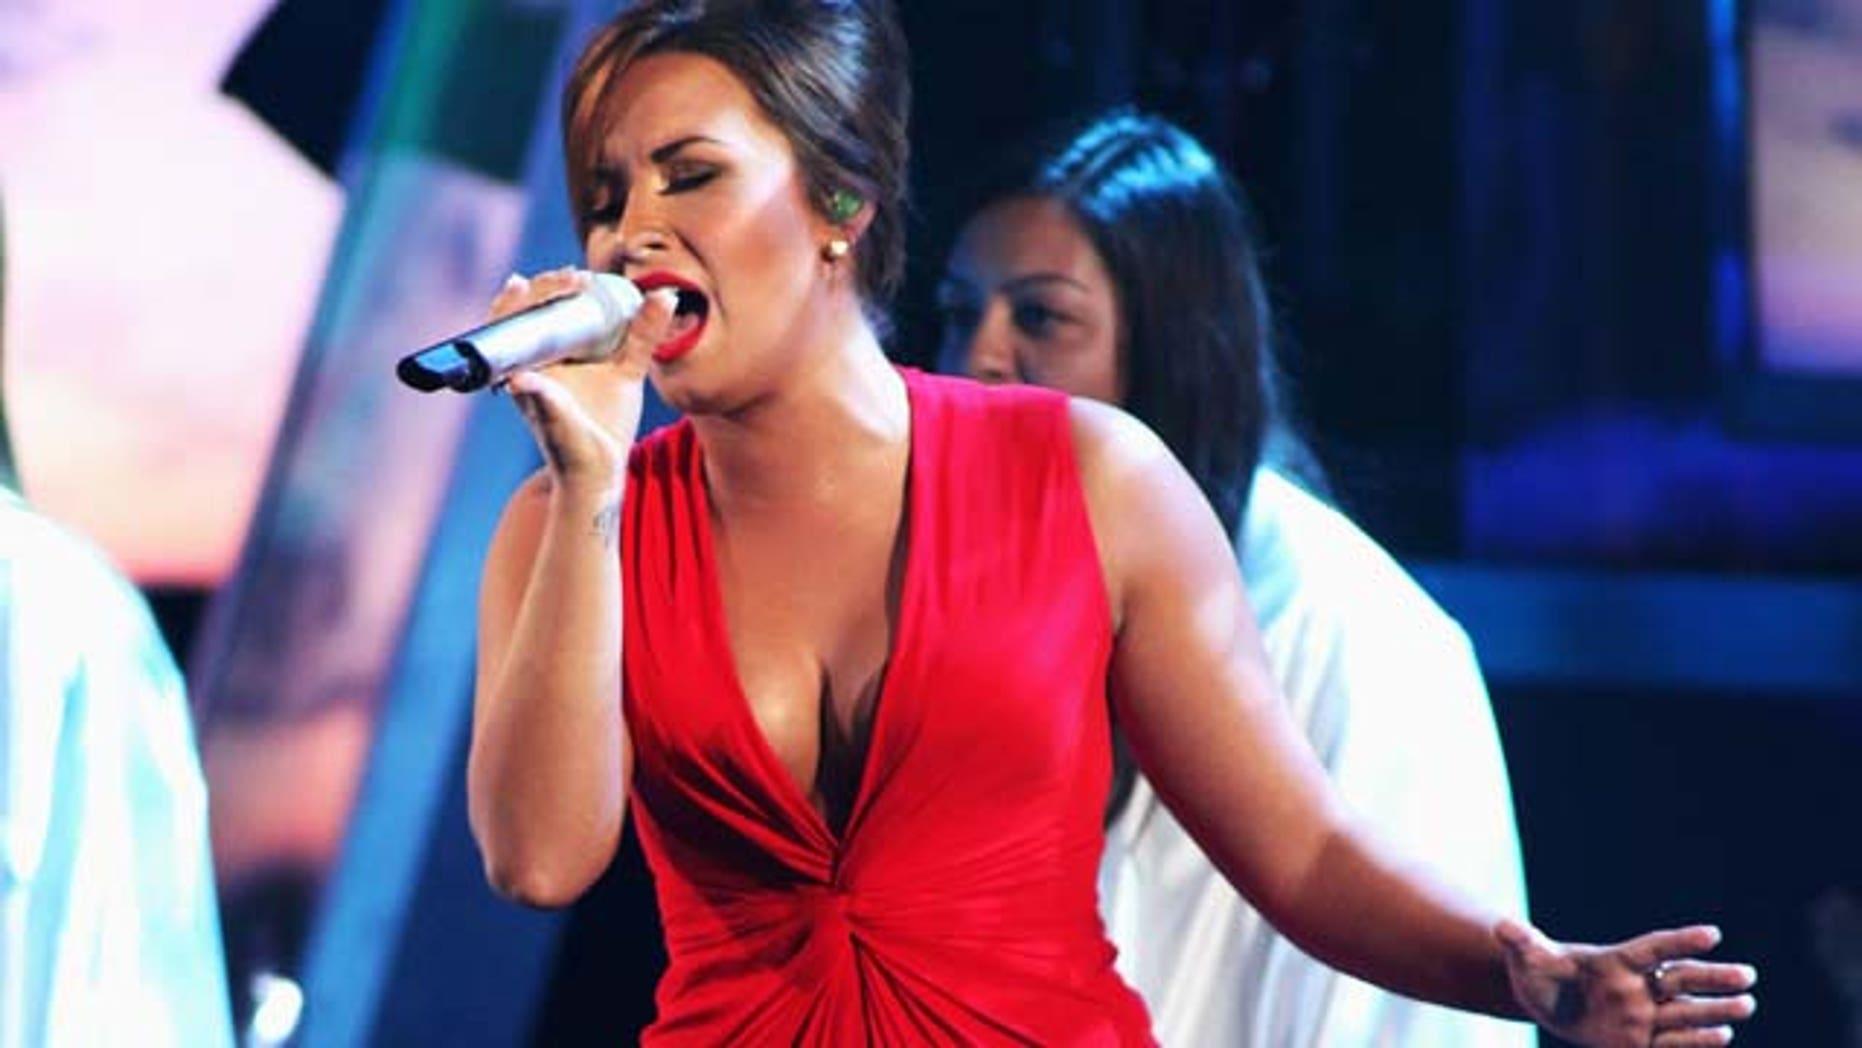 Sept. 10, 2011: Demi Lovato performs onstage during the 2011 NCLR ALMA Awards held at Santa Monica Civic Auditorium in Santa Monica, Calif.